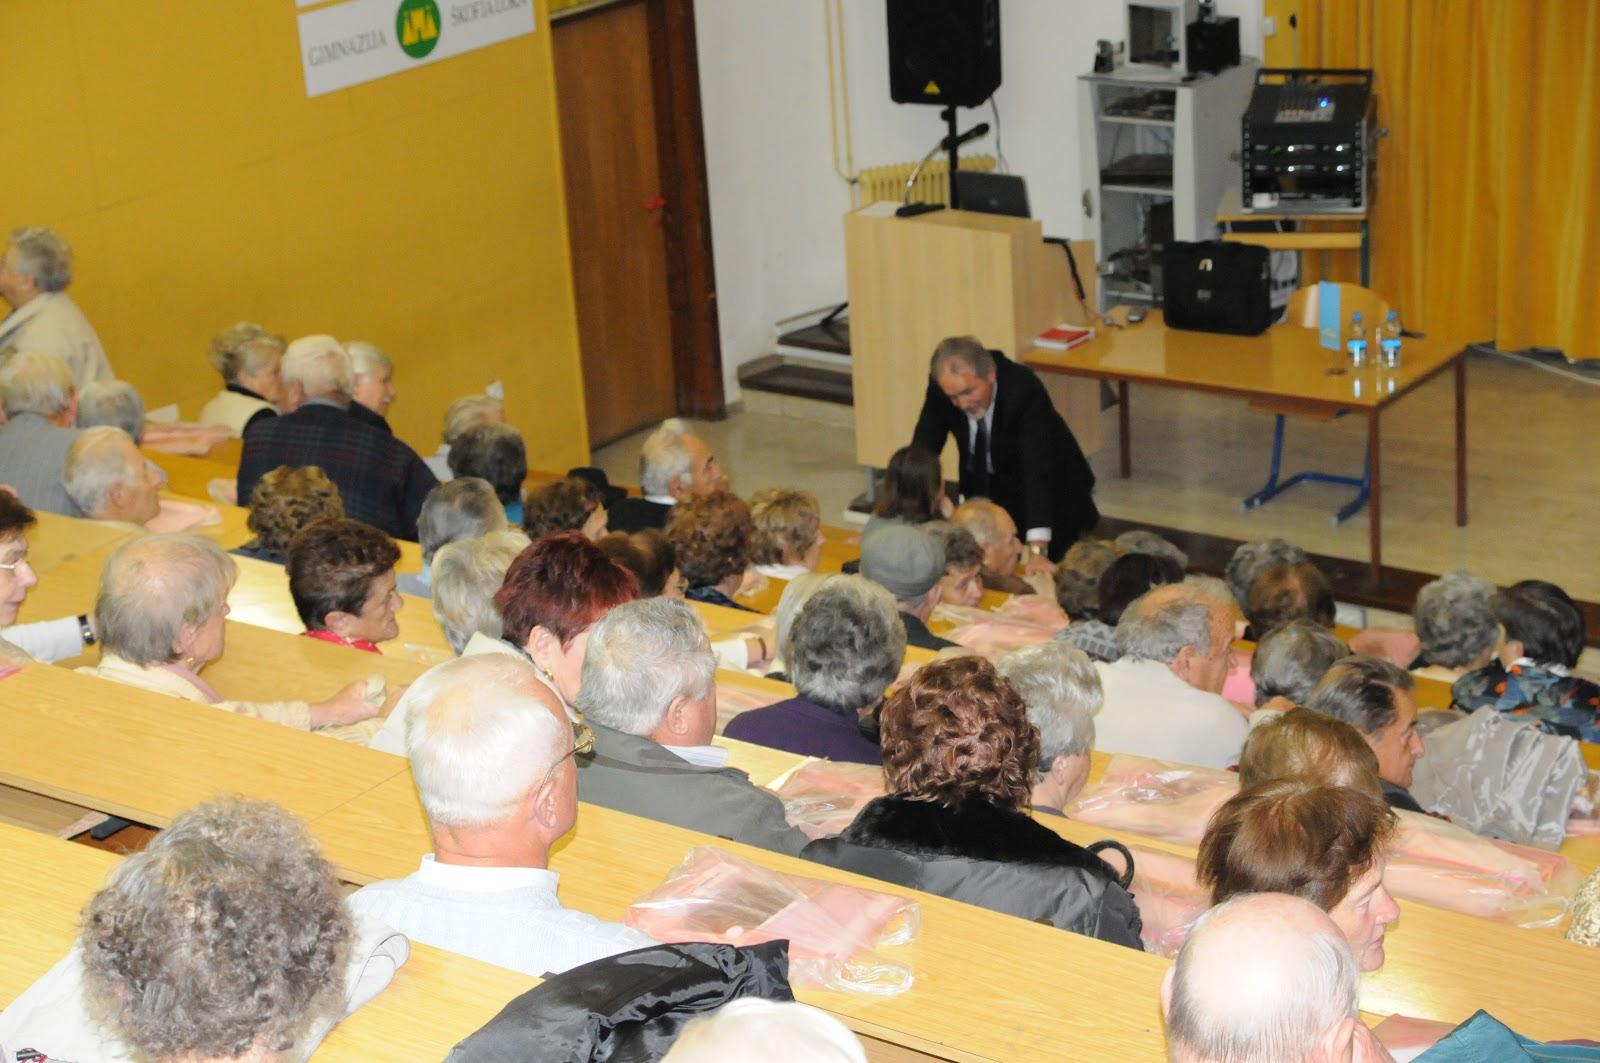 Predavanje, dr. Camlek - oktober 2011 - DSC_3857.JPG